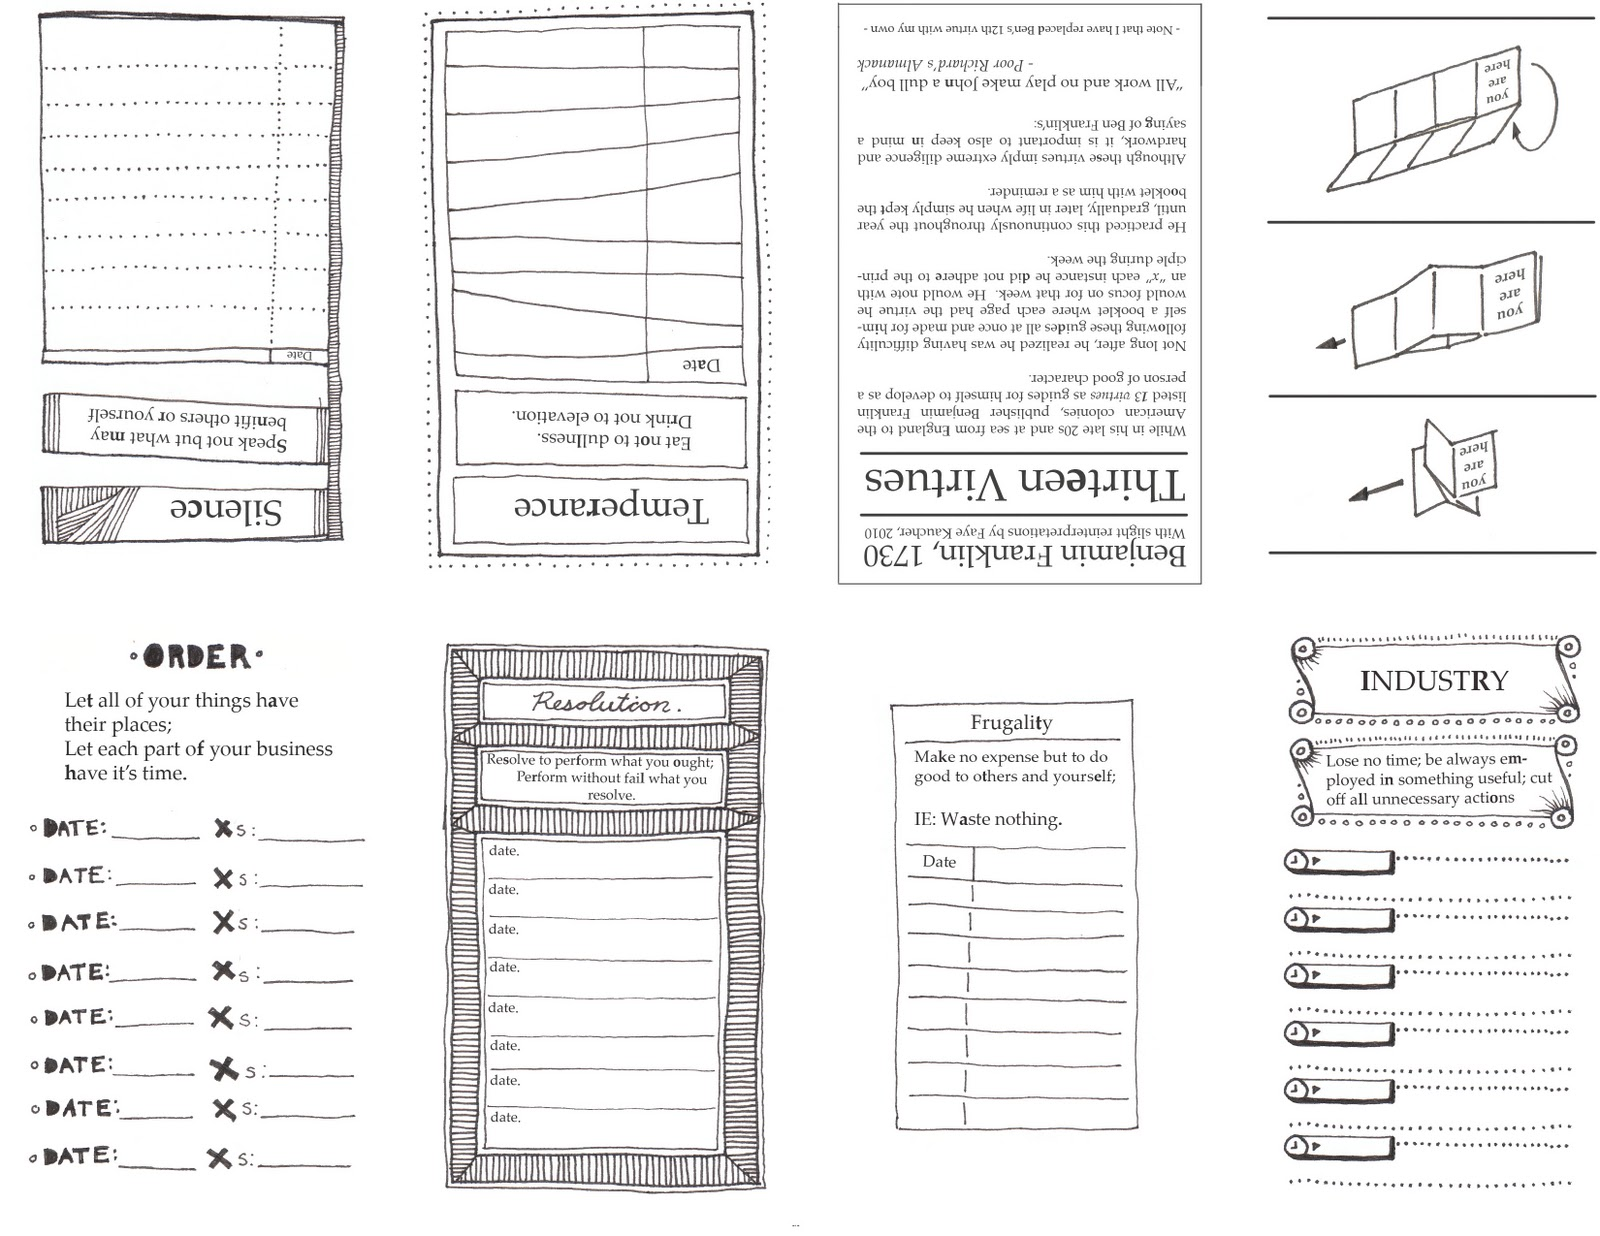 http://3.bp.blogspot.com/_vO5gzH-otig/TLt91htGDdI/AAAAAAAAAOE/awN6kN8yTuc/s1600/benfranklin-booklet2+copy.jpg